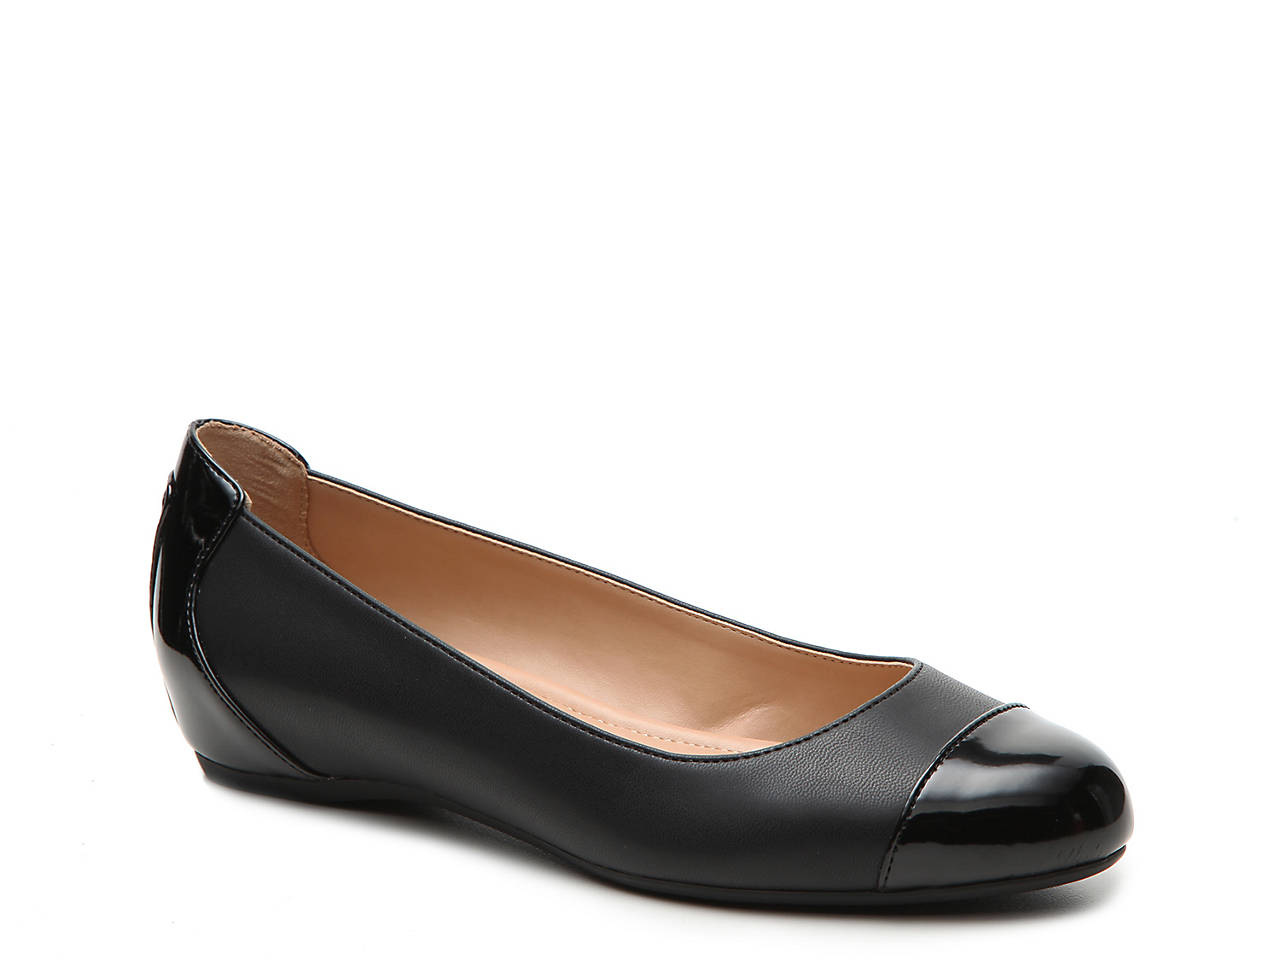 0210a74f6274 Abella Cadidia Ballet Flat Women s Shoes